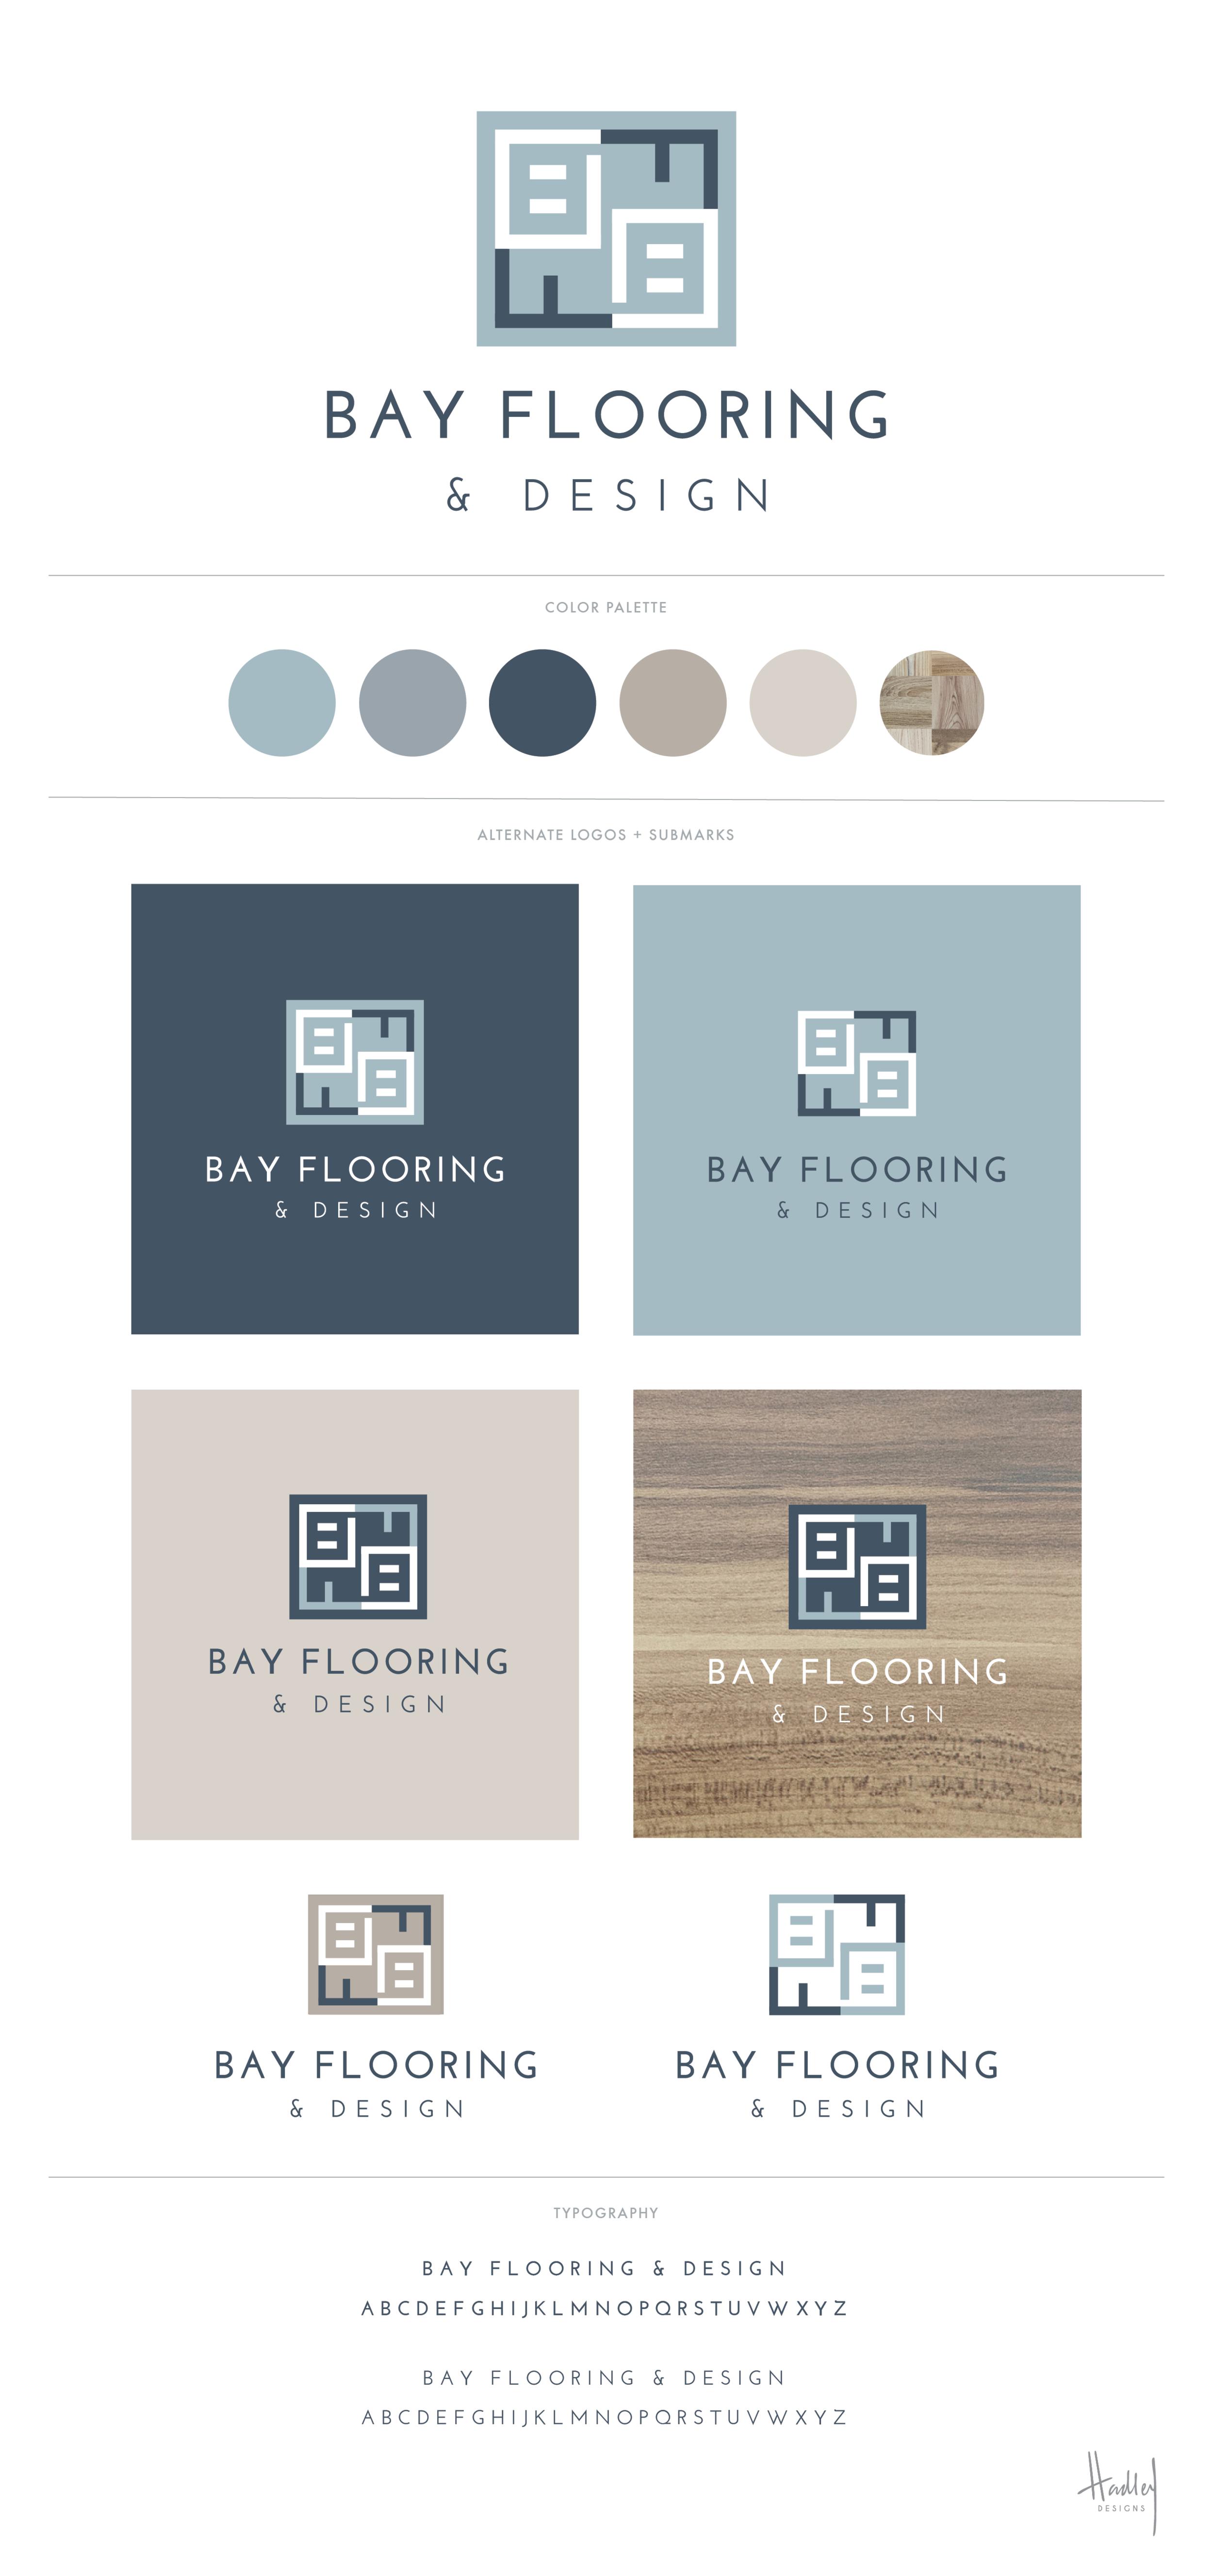 Bay Flooring - Hadley Binion Designs